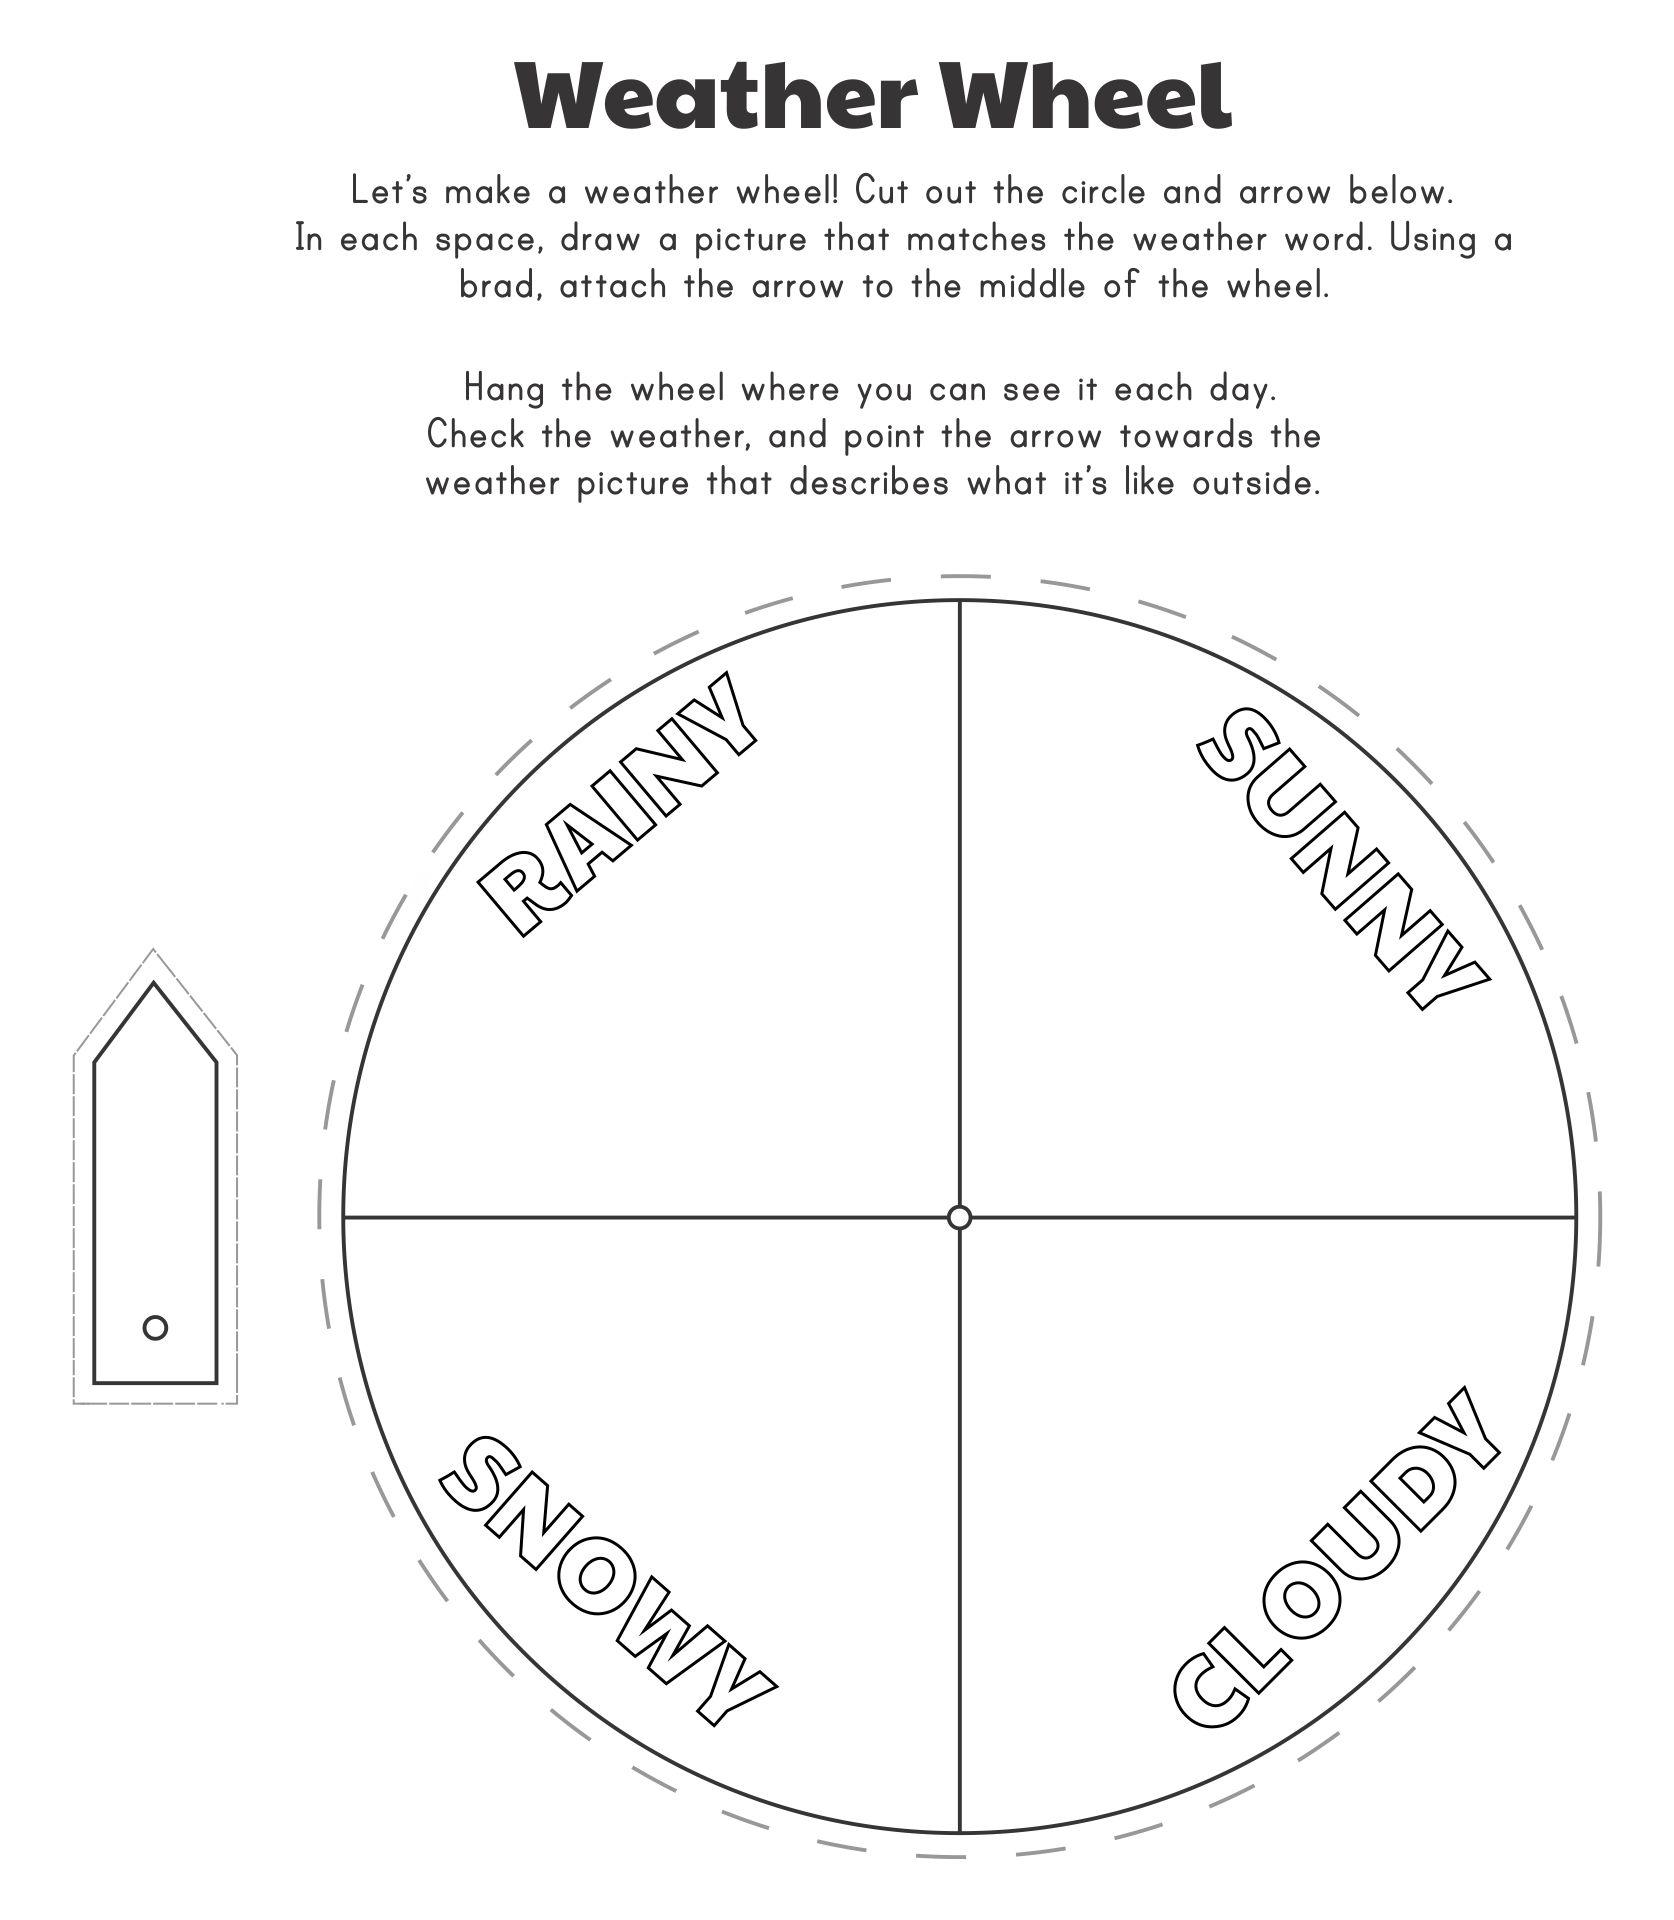 Printable Weather Wheel For Preschoolers